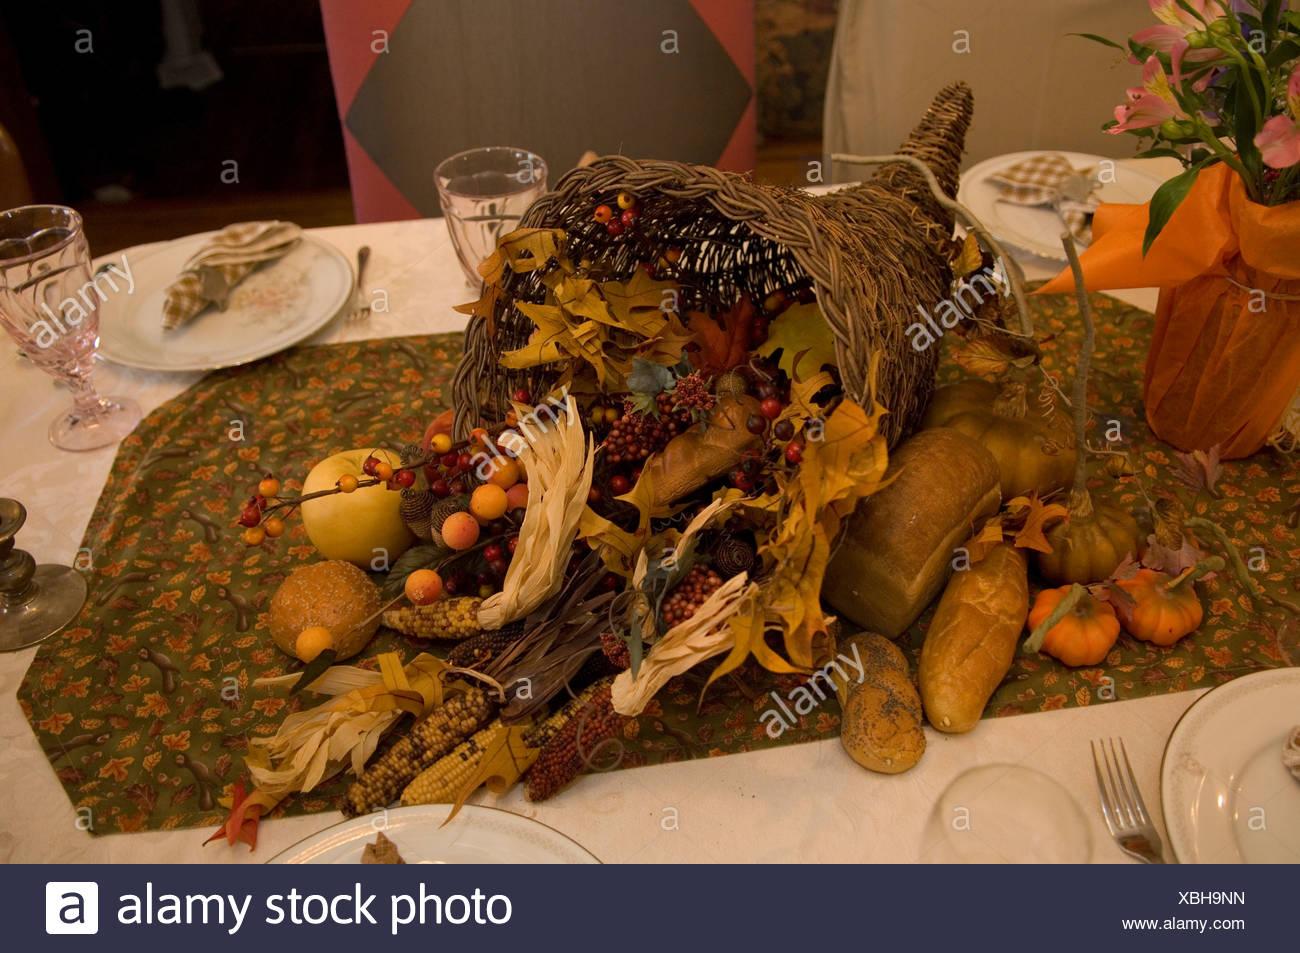 A Thanksgiving cornucopia. - Stock Image